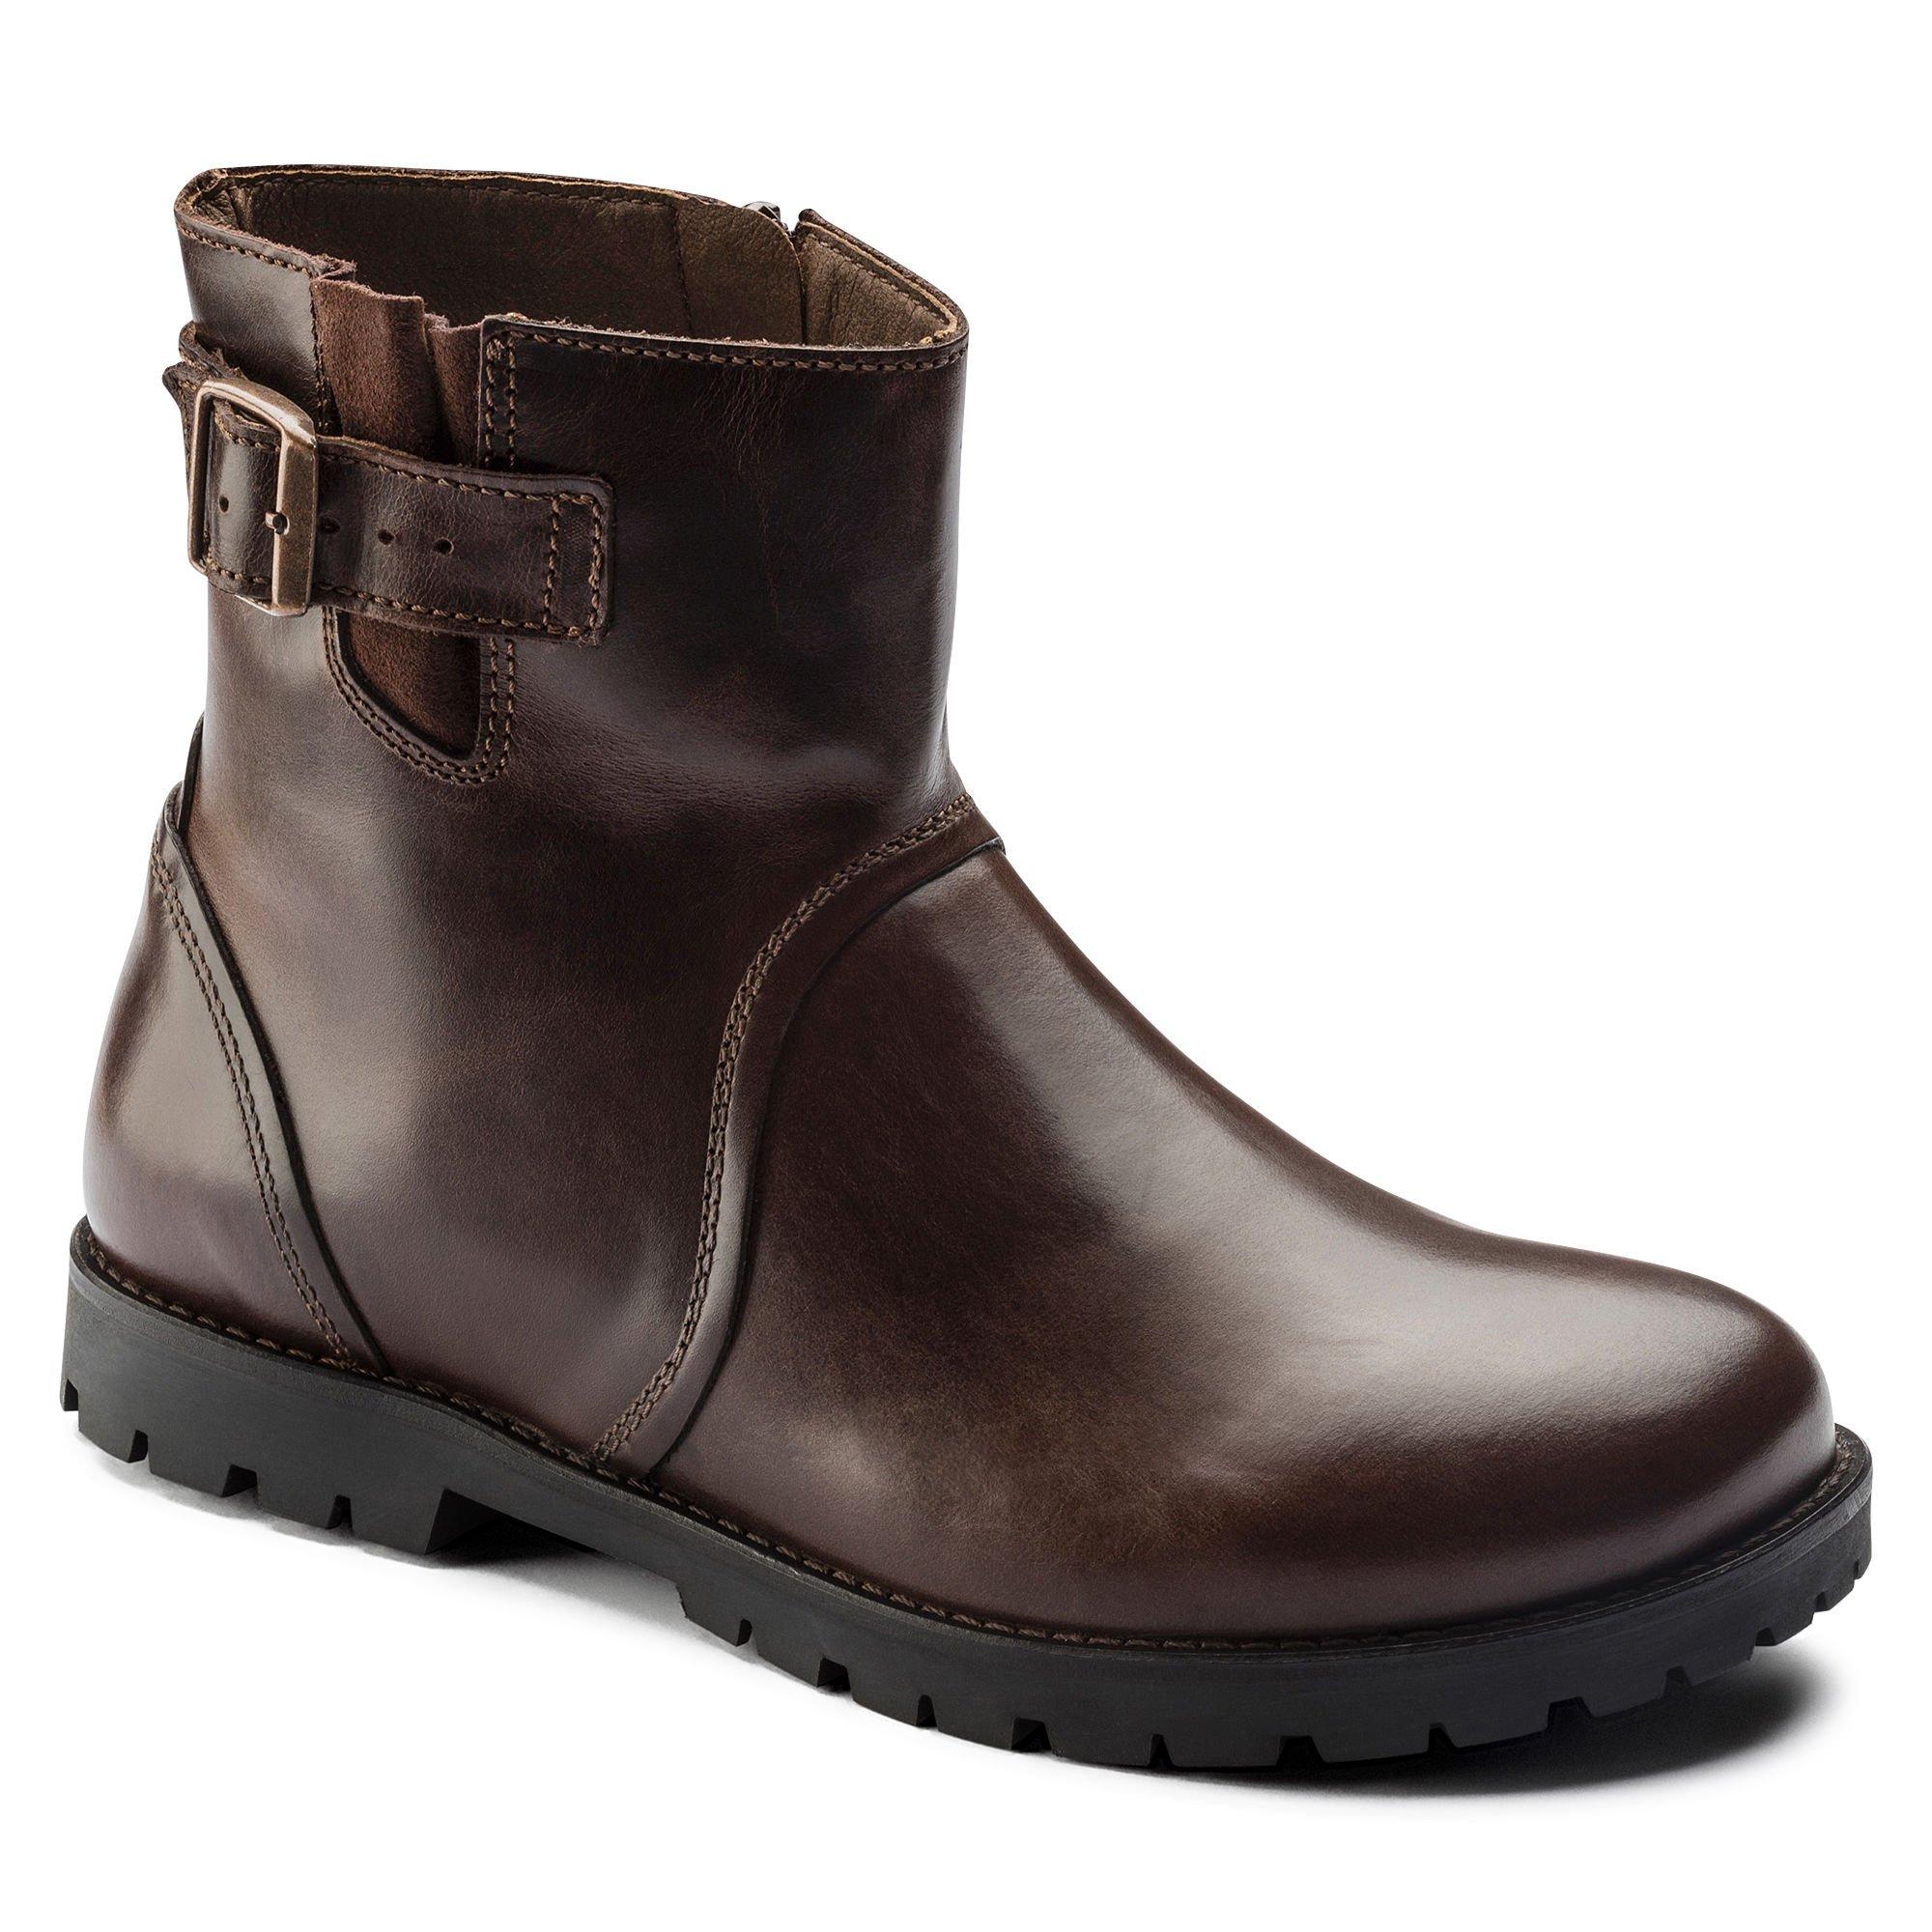 Birkenstock Women's Stowe Boot Espresso Leather Size 40 M EU